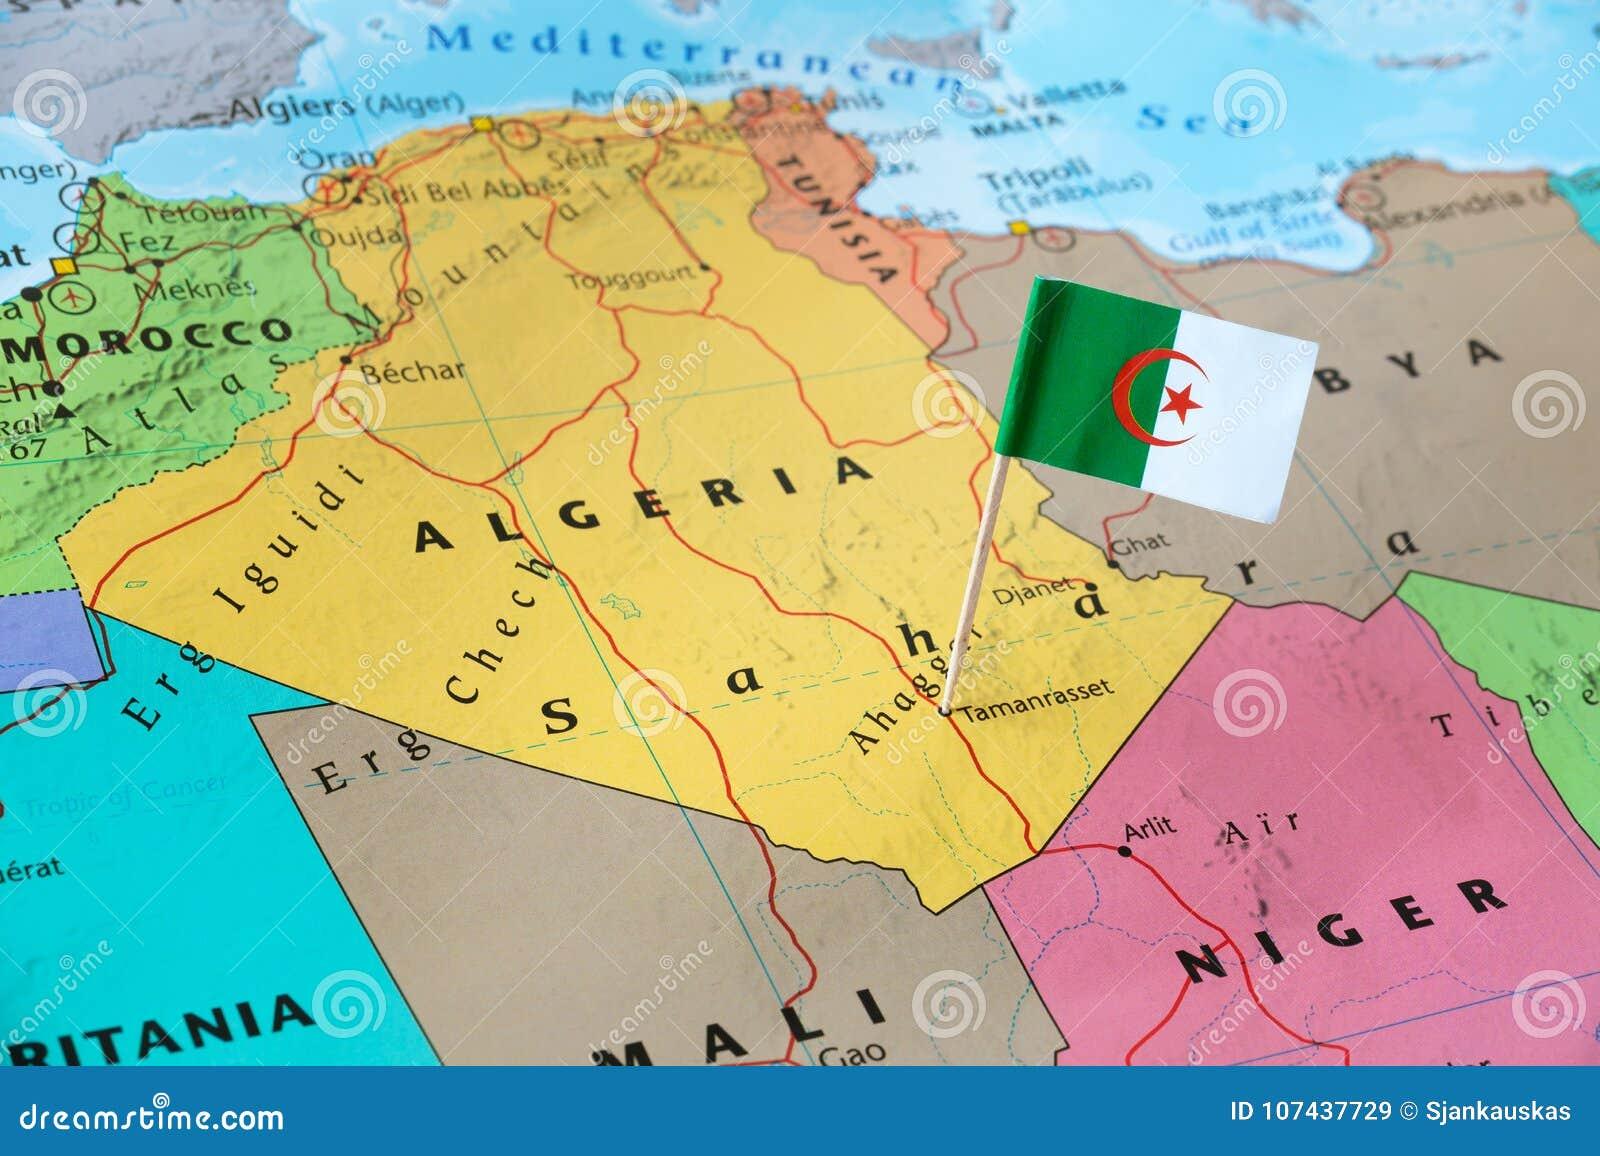 Algeria Flag Pin On Map Stock Image Image Of Holidays 107437729